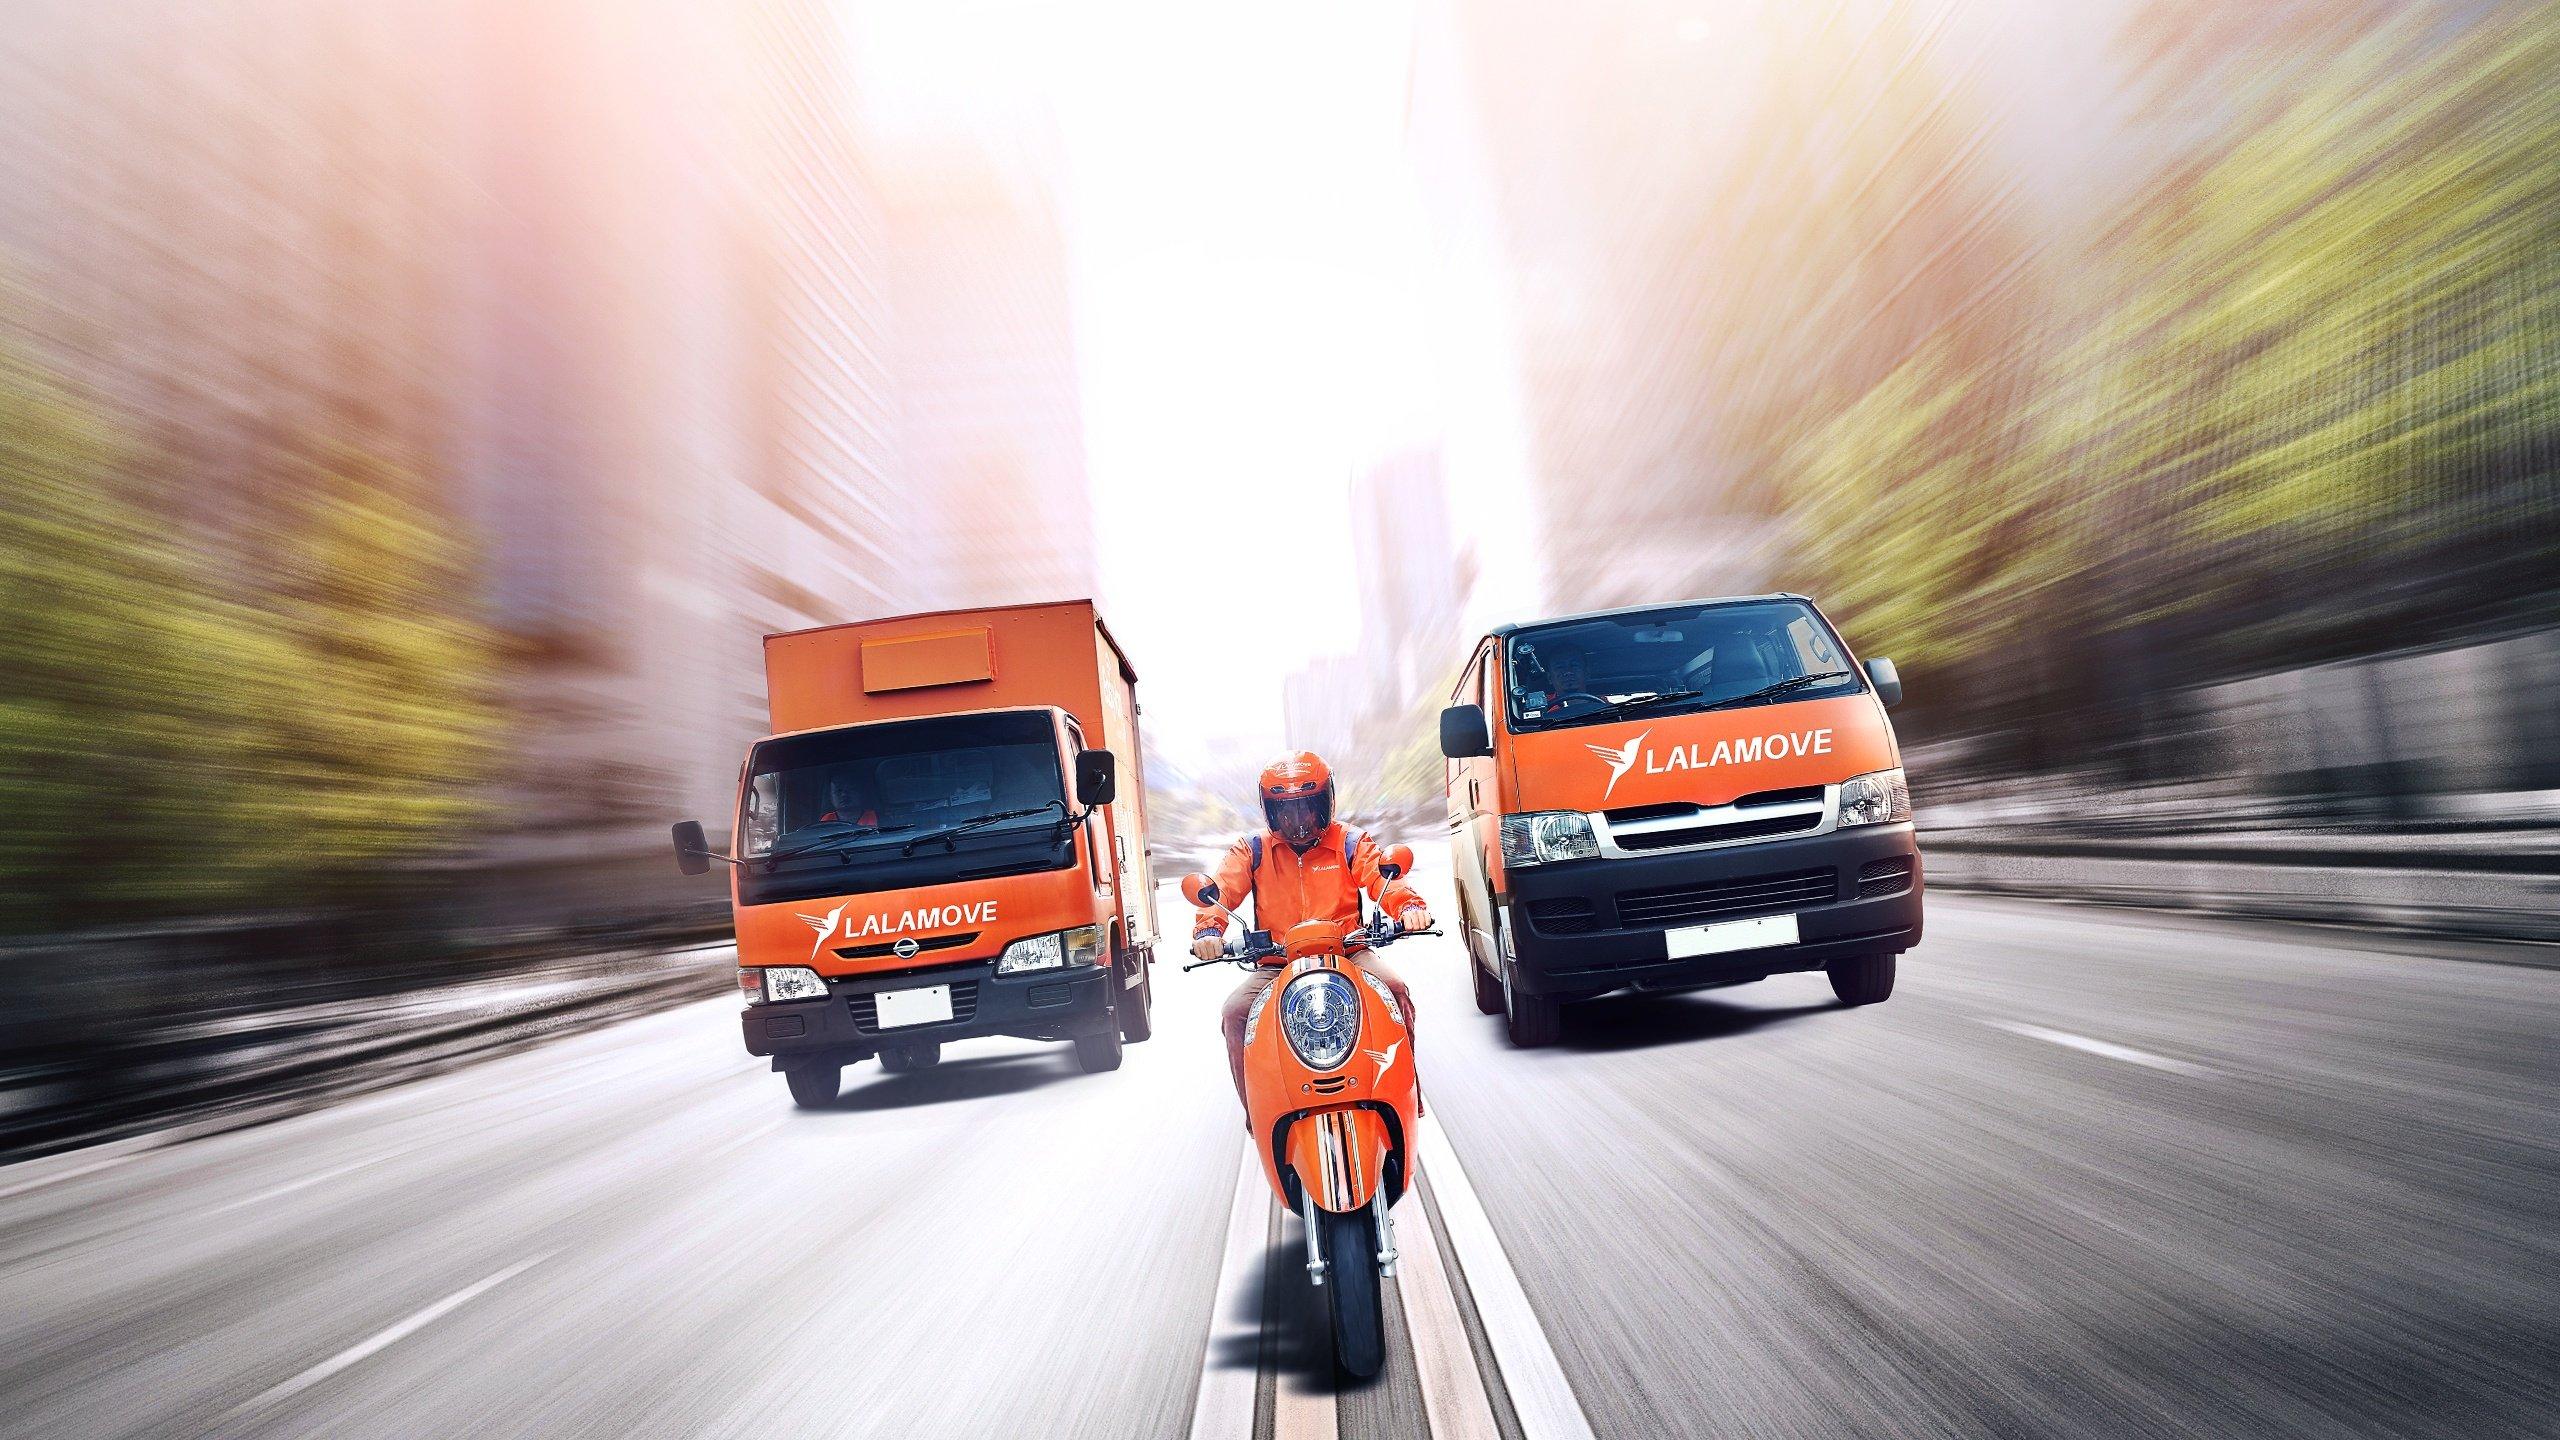 Lalamove-vehicles.jpg